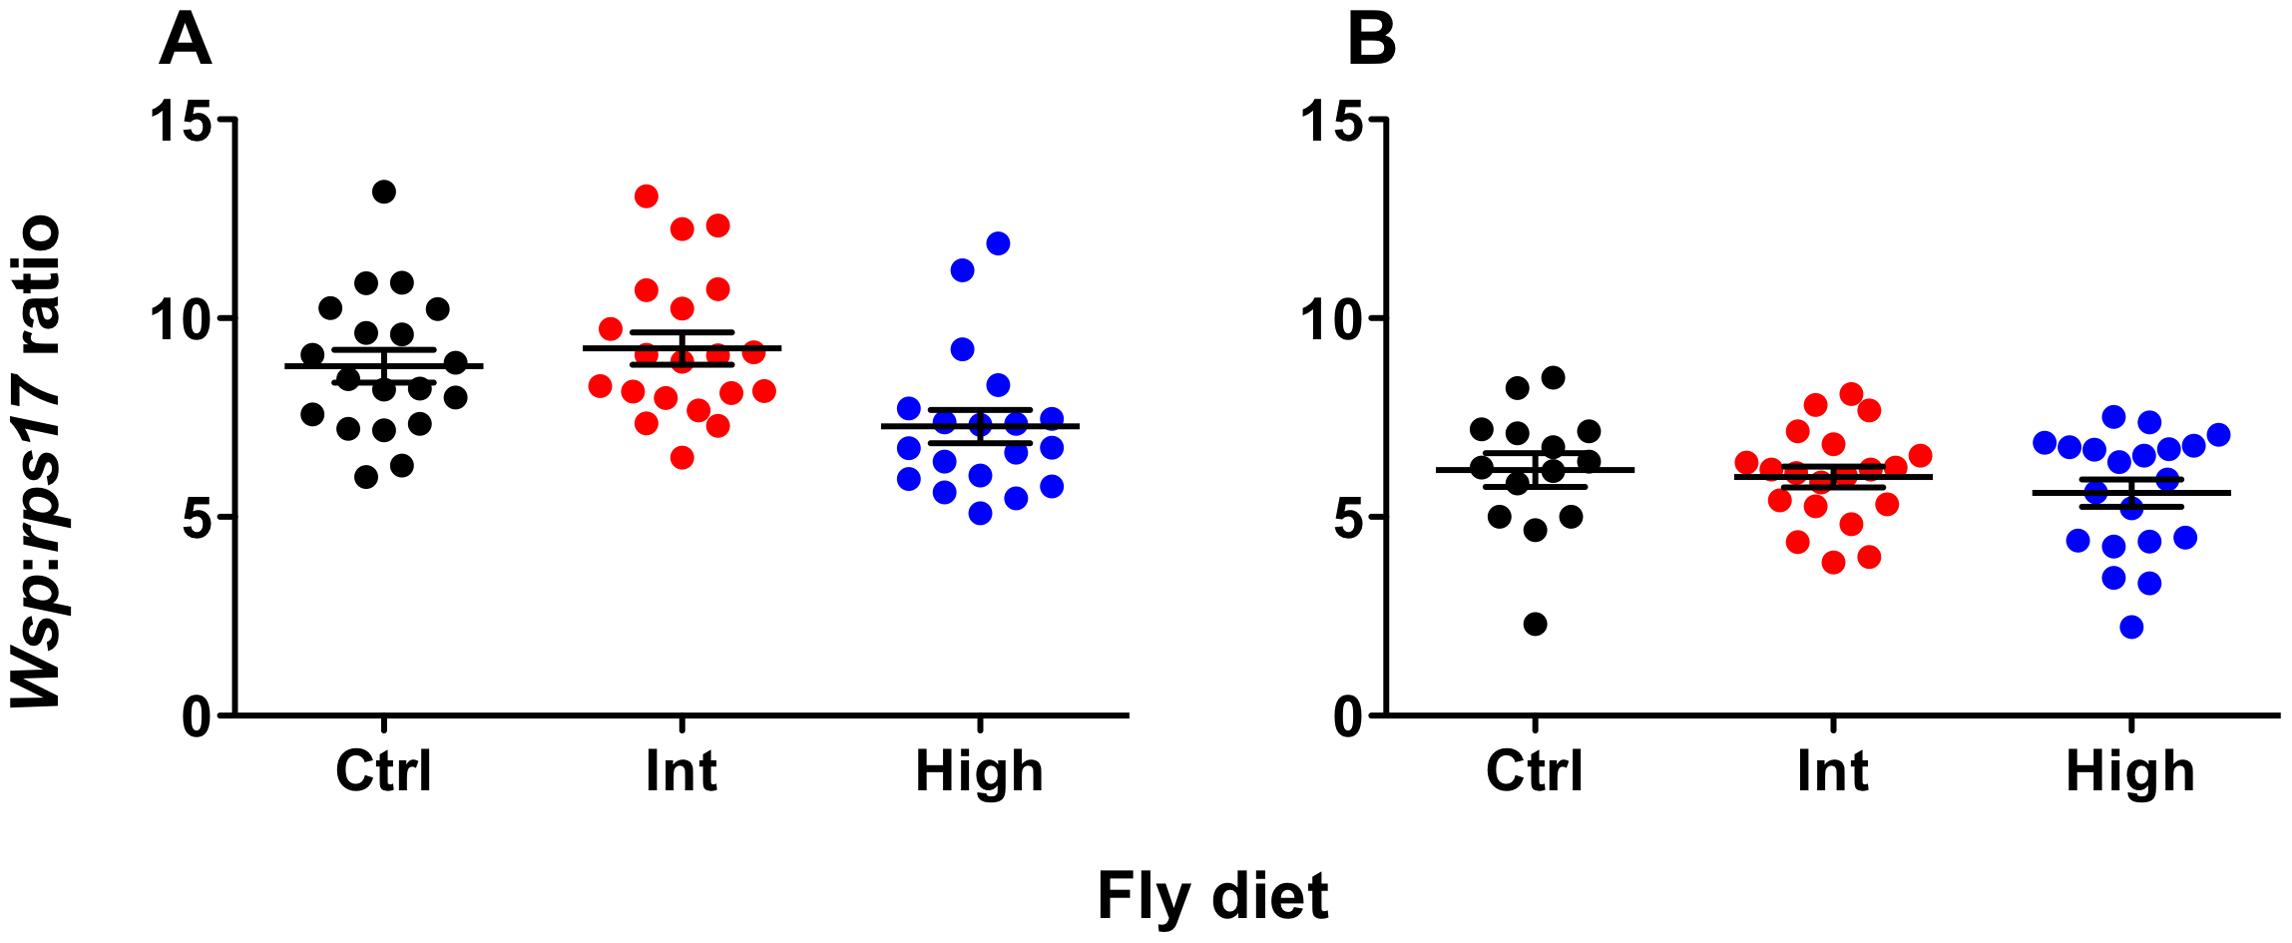 <b><i>Wolbachia</i></b><b> levels of flies reared on cholesterol-enriched food.</b>